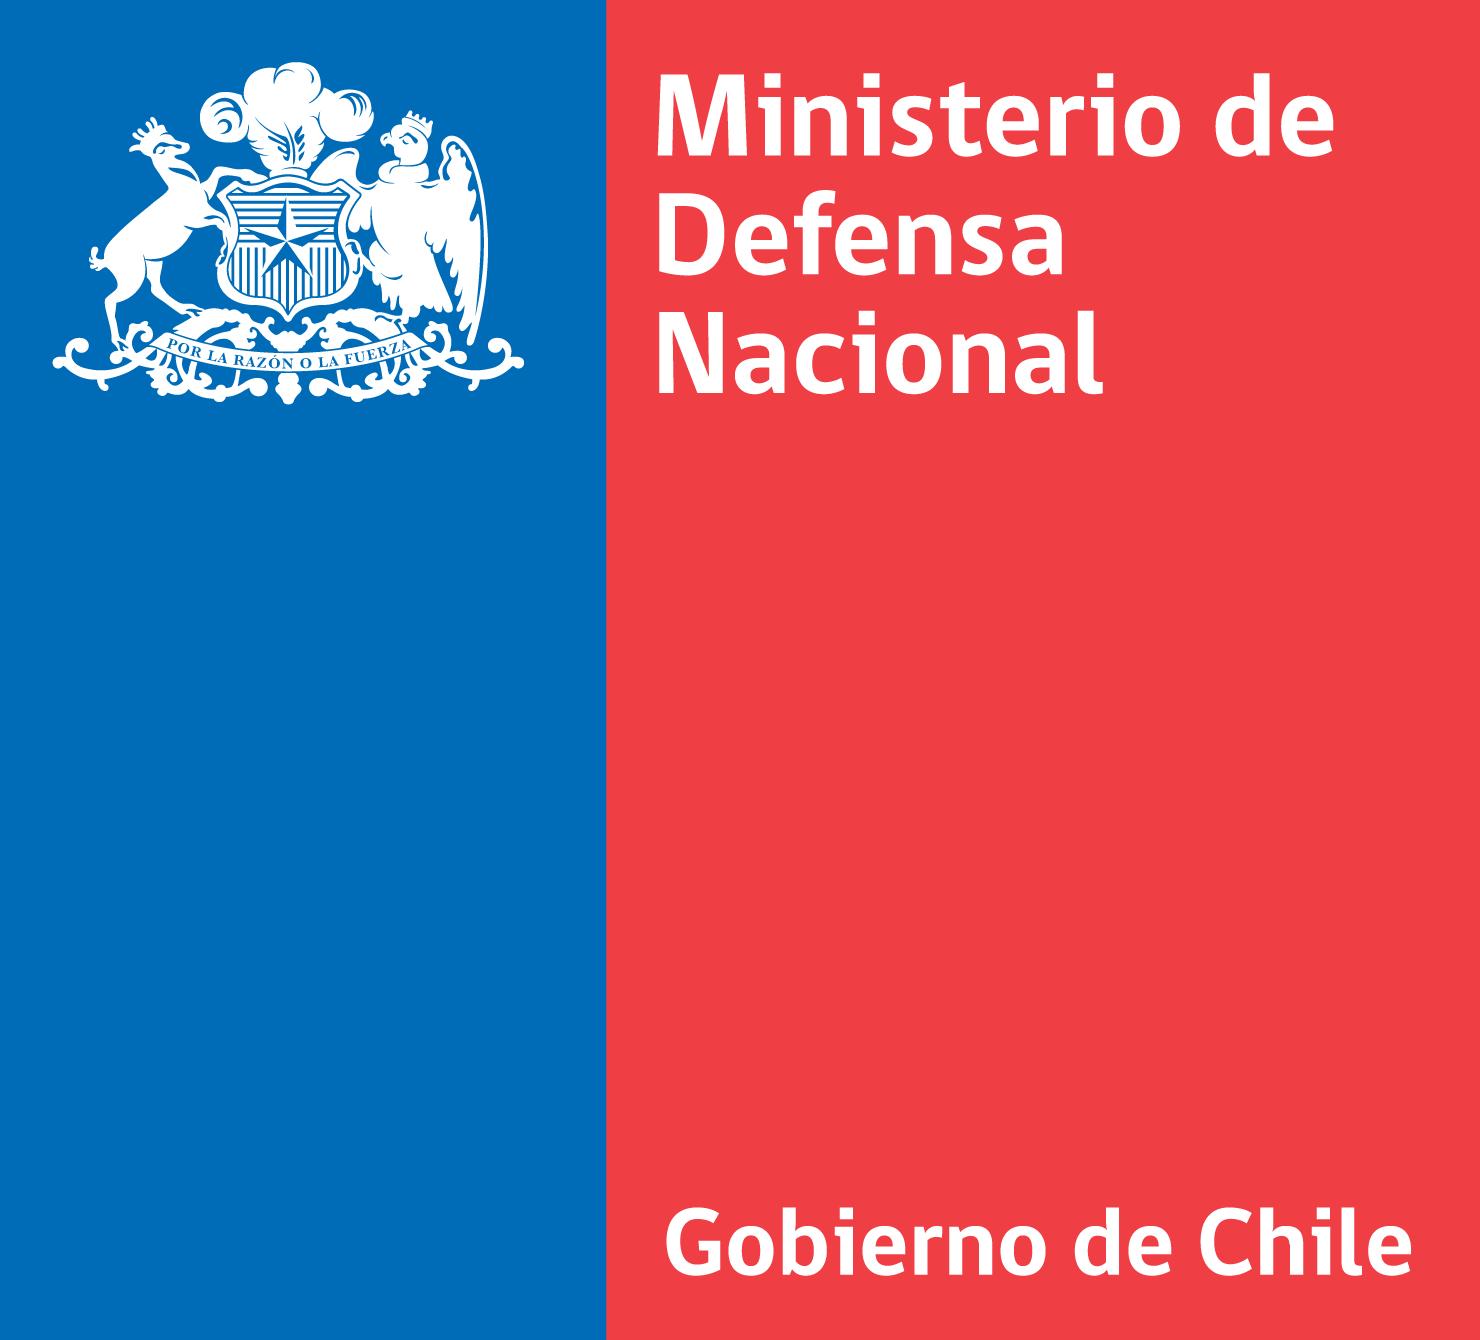 Depiction of Ministerio de Defensa Nacional de Chile